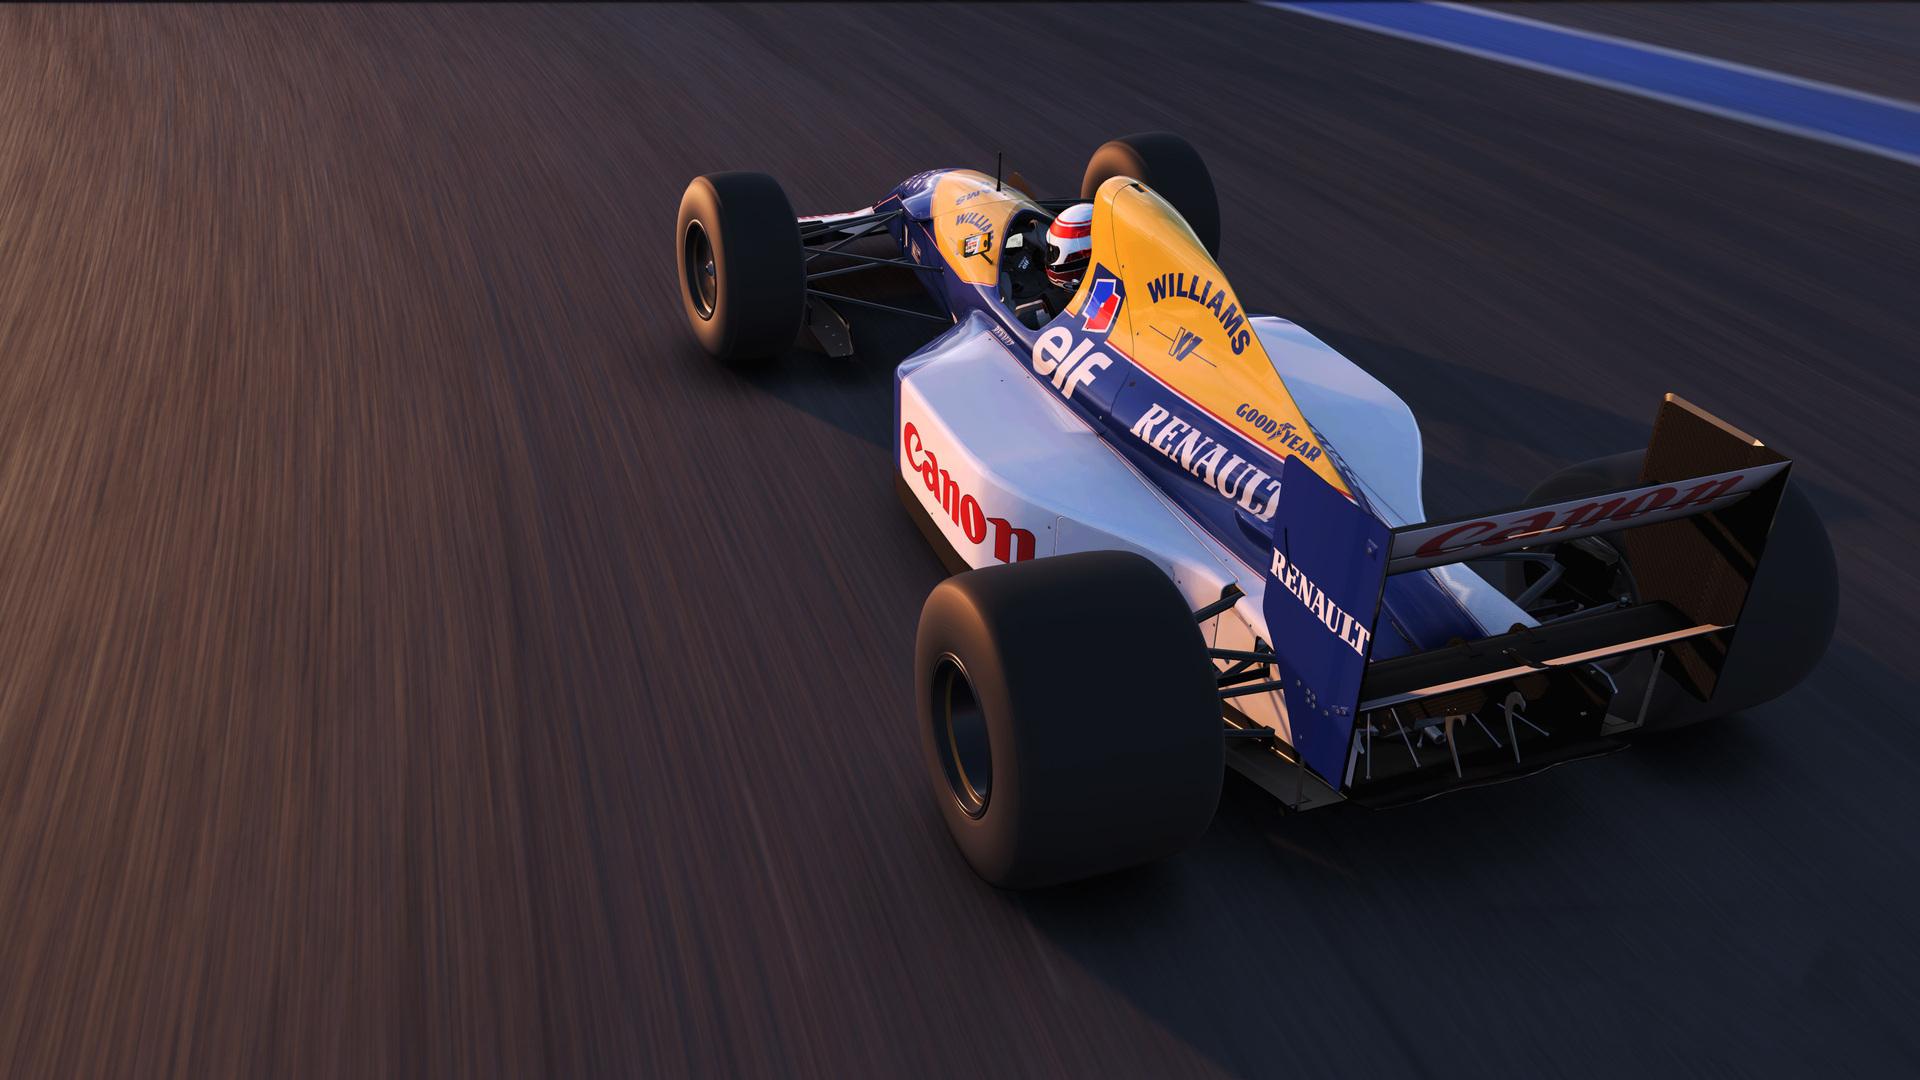 Wallpaper Formula 1 Logo F1 Logo 4k 8k Sports 15267: 1920x1080 F1 2018 Video Game 4k Laptop Full HD 1080P HD 4k